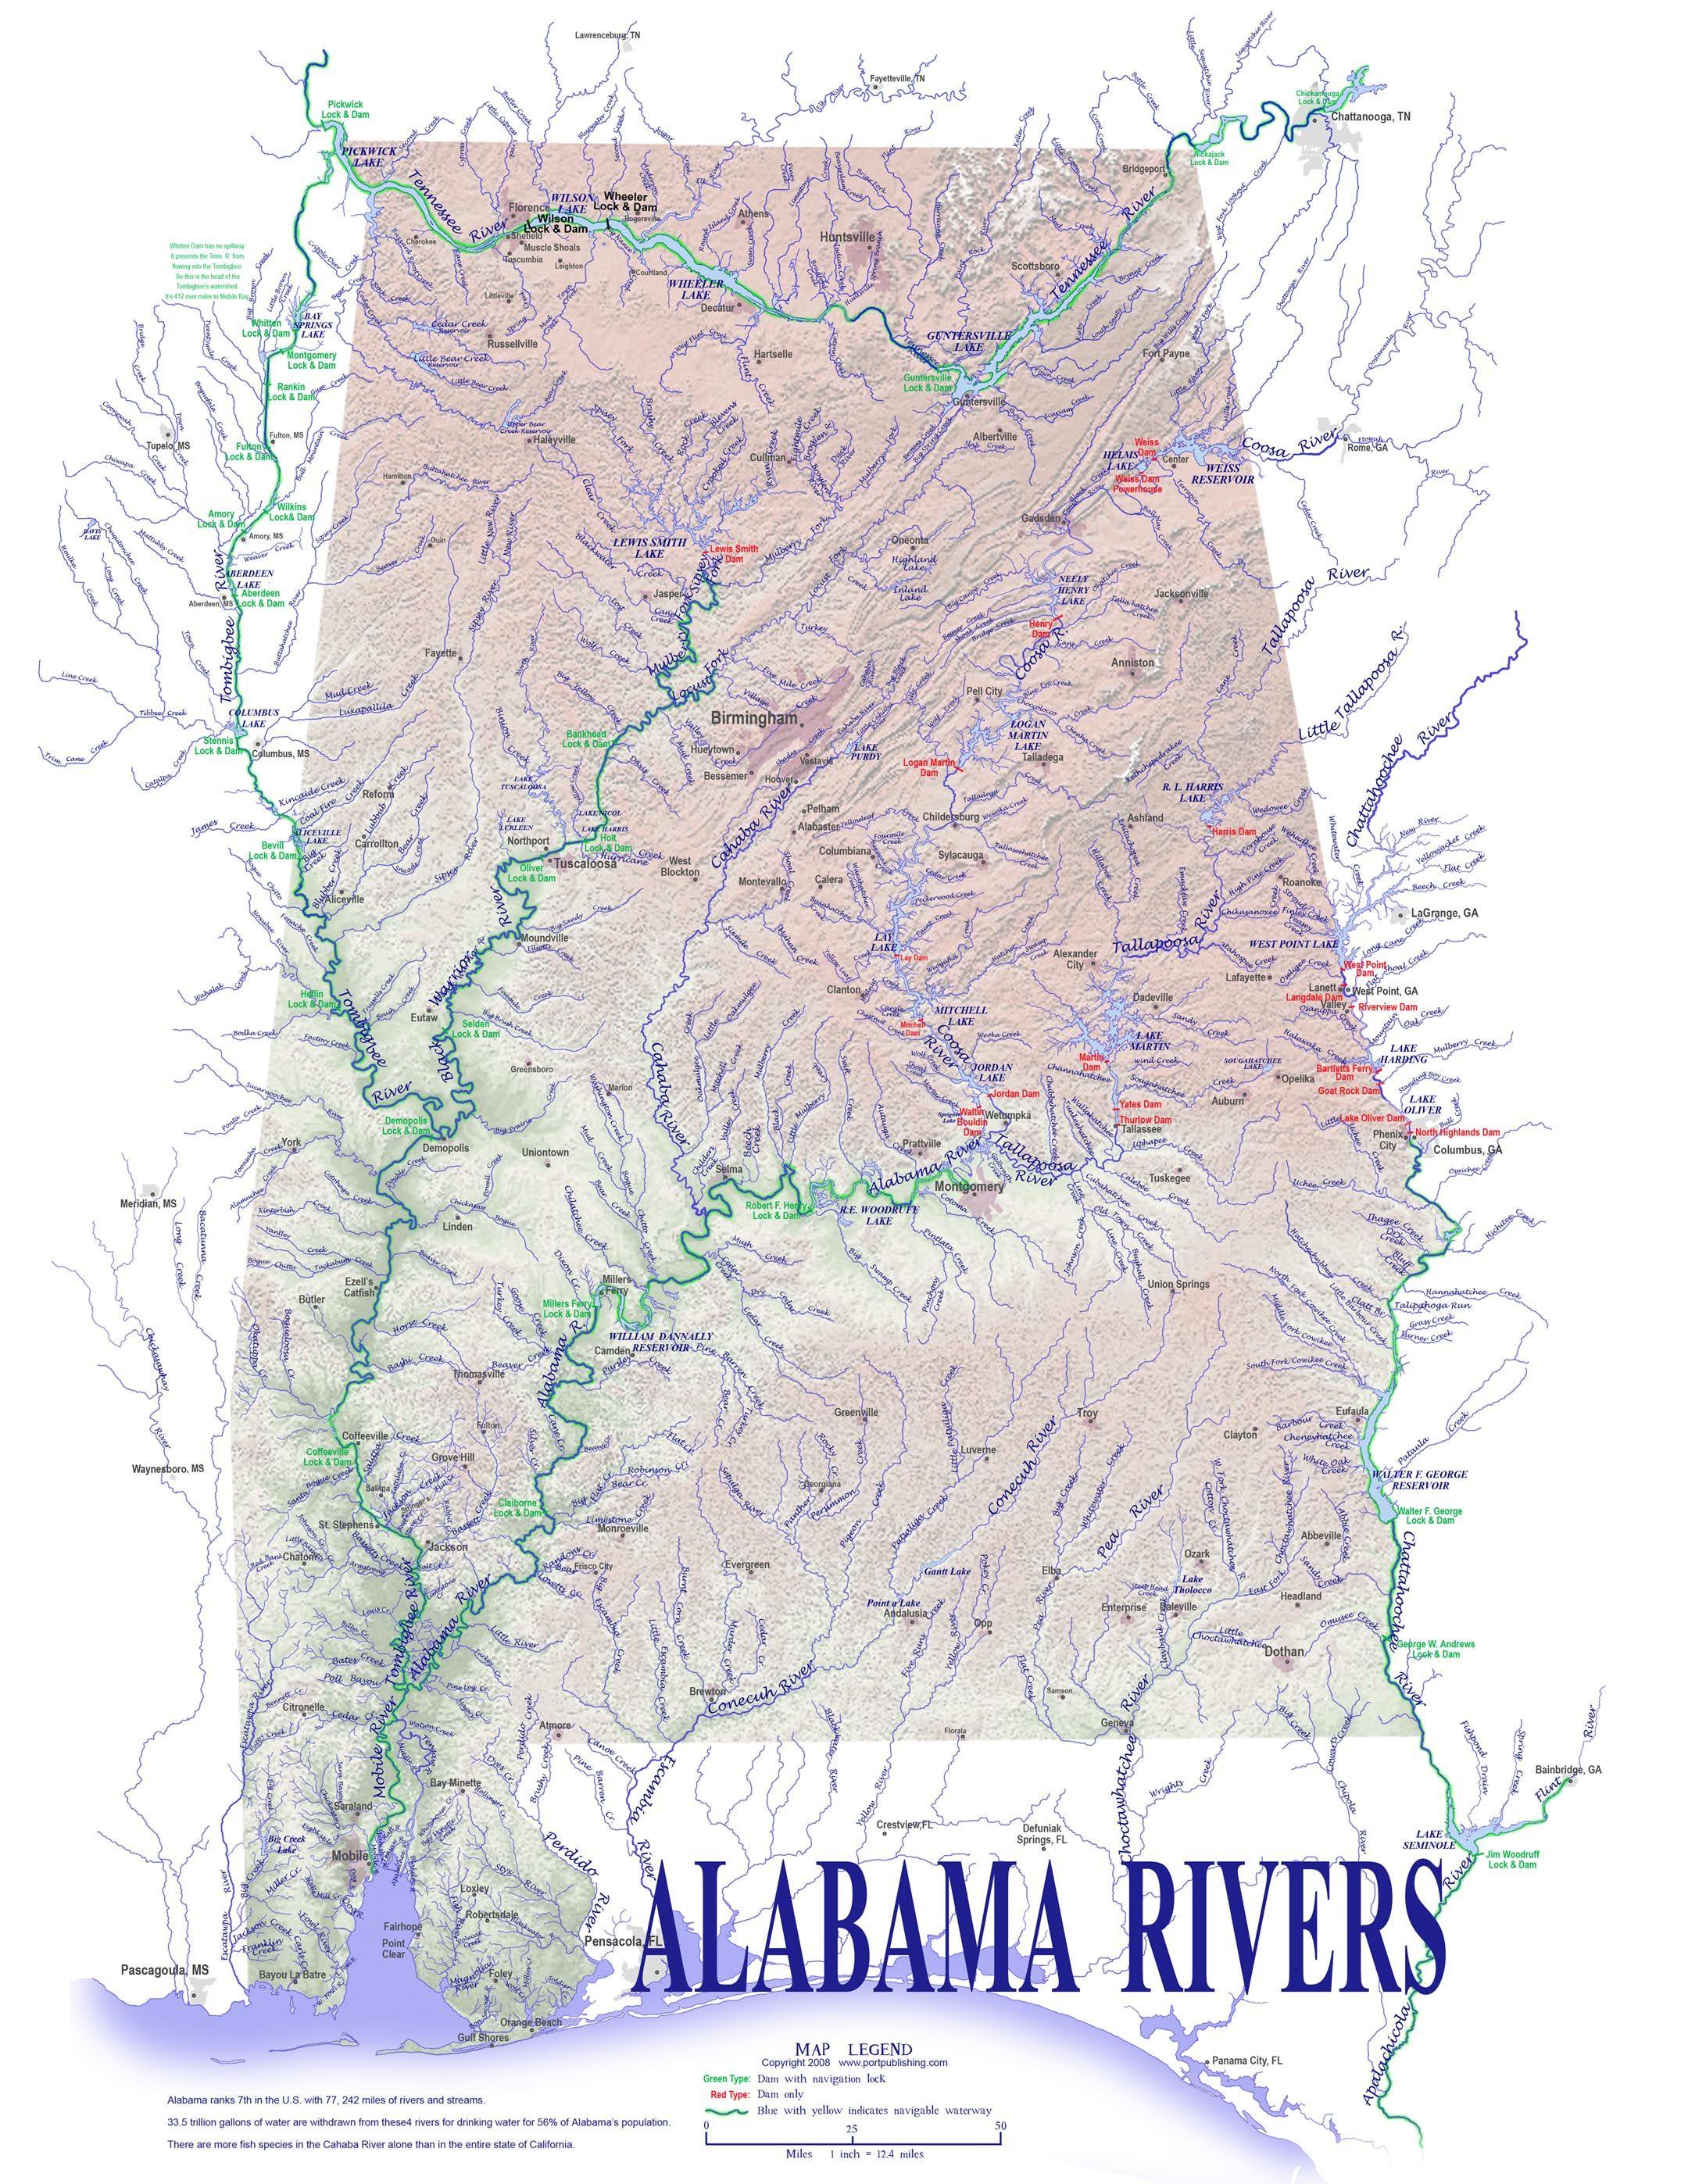 Alabama Rivers Map Maps Pinterest Alabama And Rivers - Us map rivers